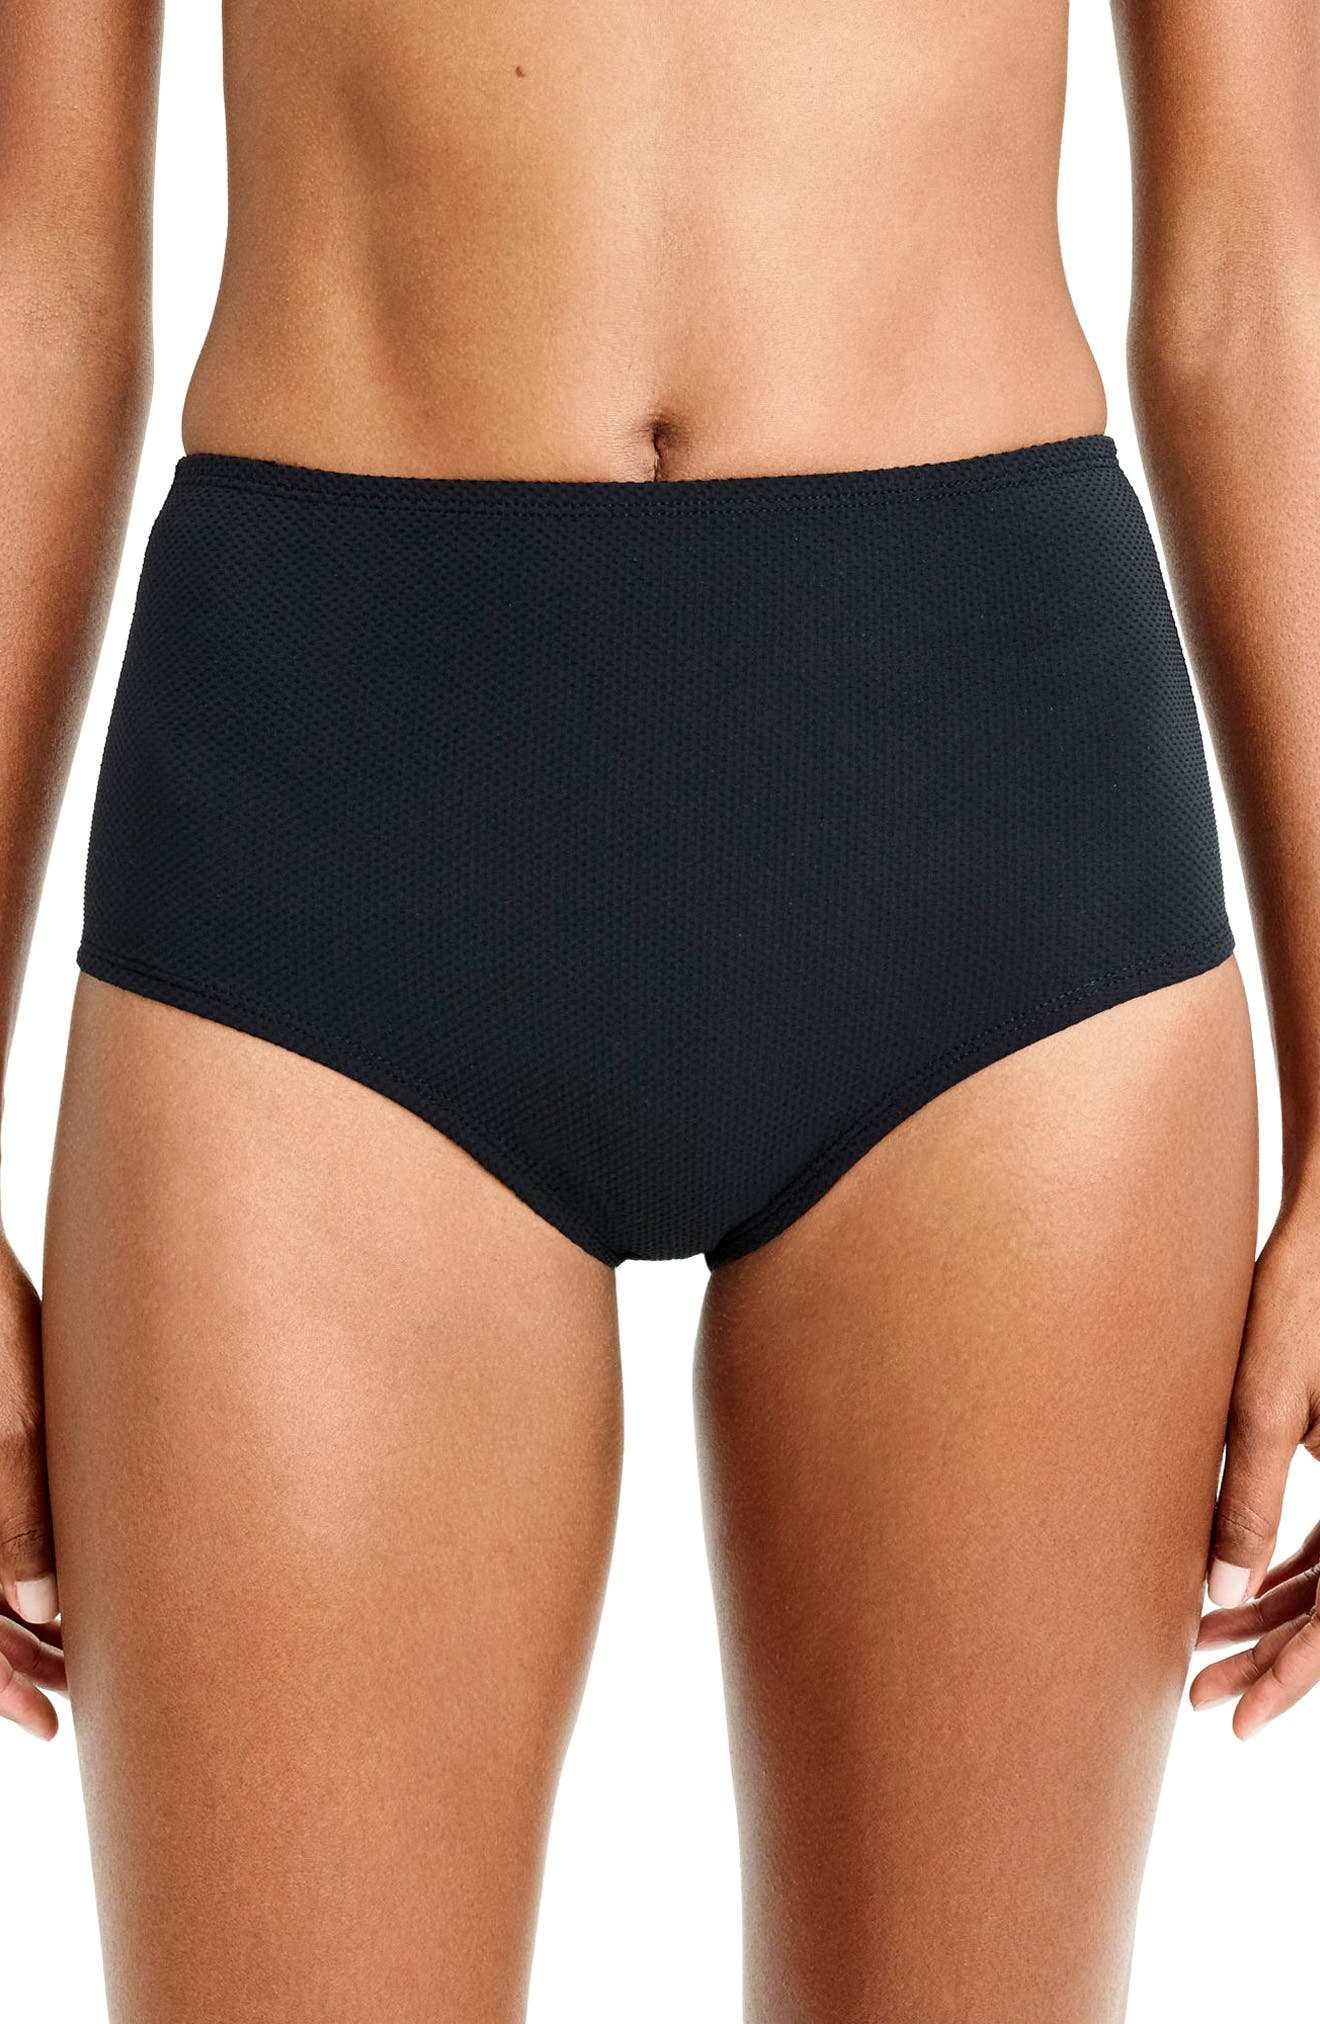 Piqué High Waist Bikini Bottoms,                         Main,                         color, 001